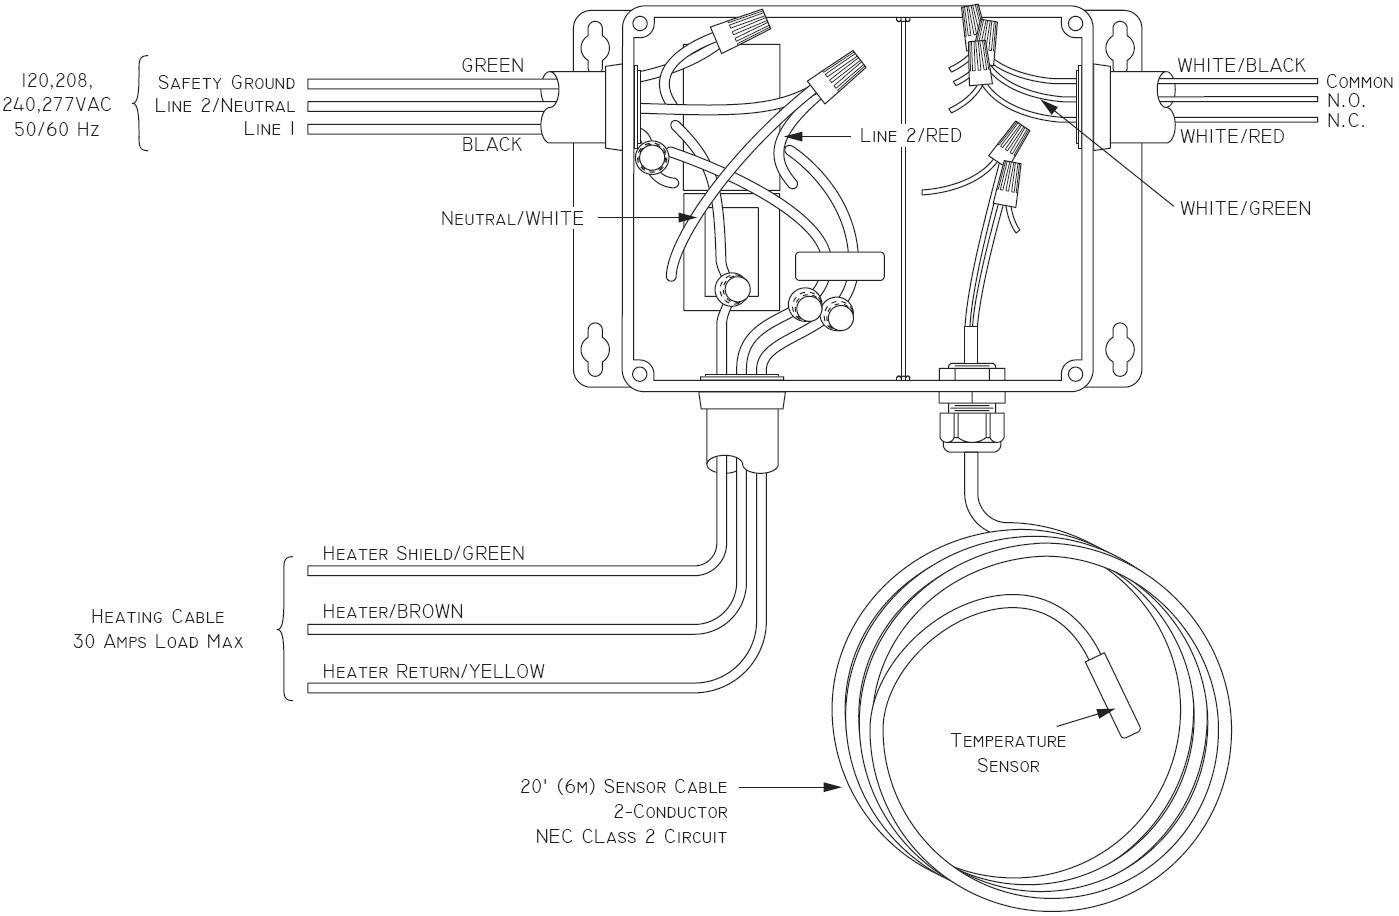 electric baseboard heat wiring diagram honeywell y plan central heating frenheit